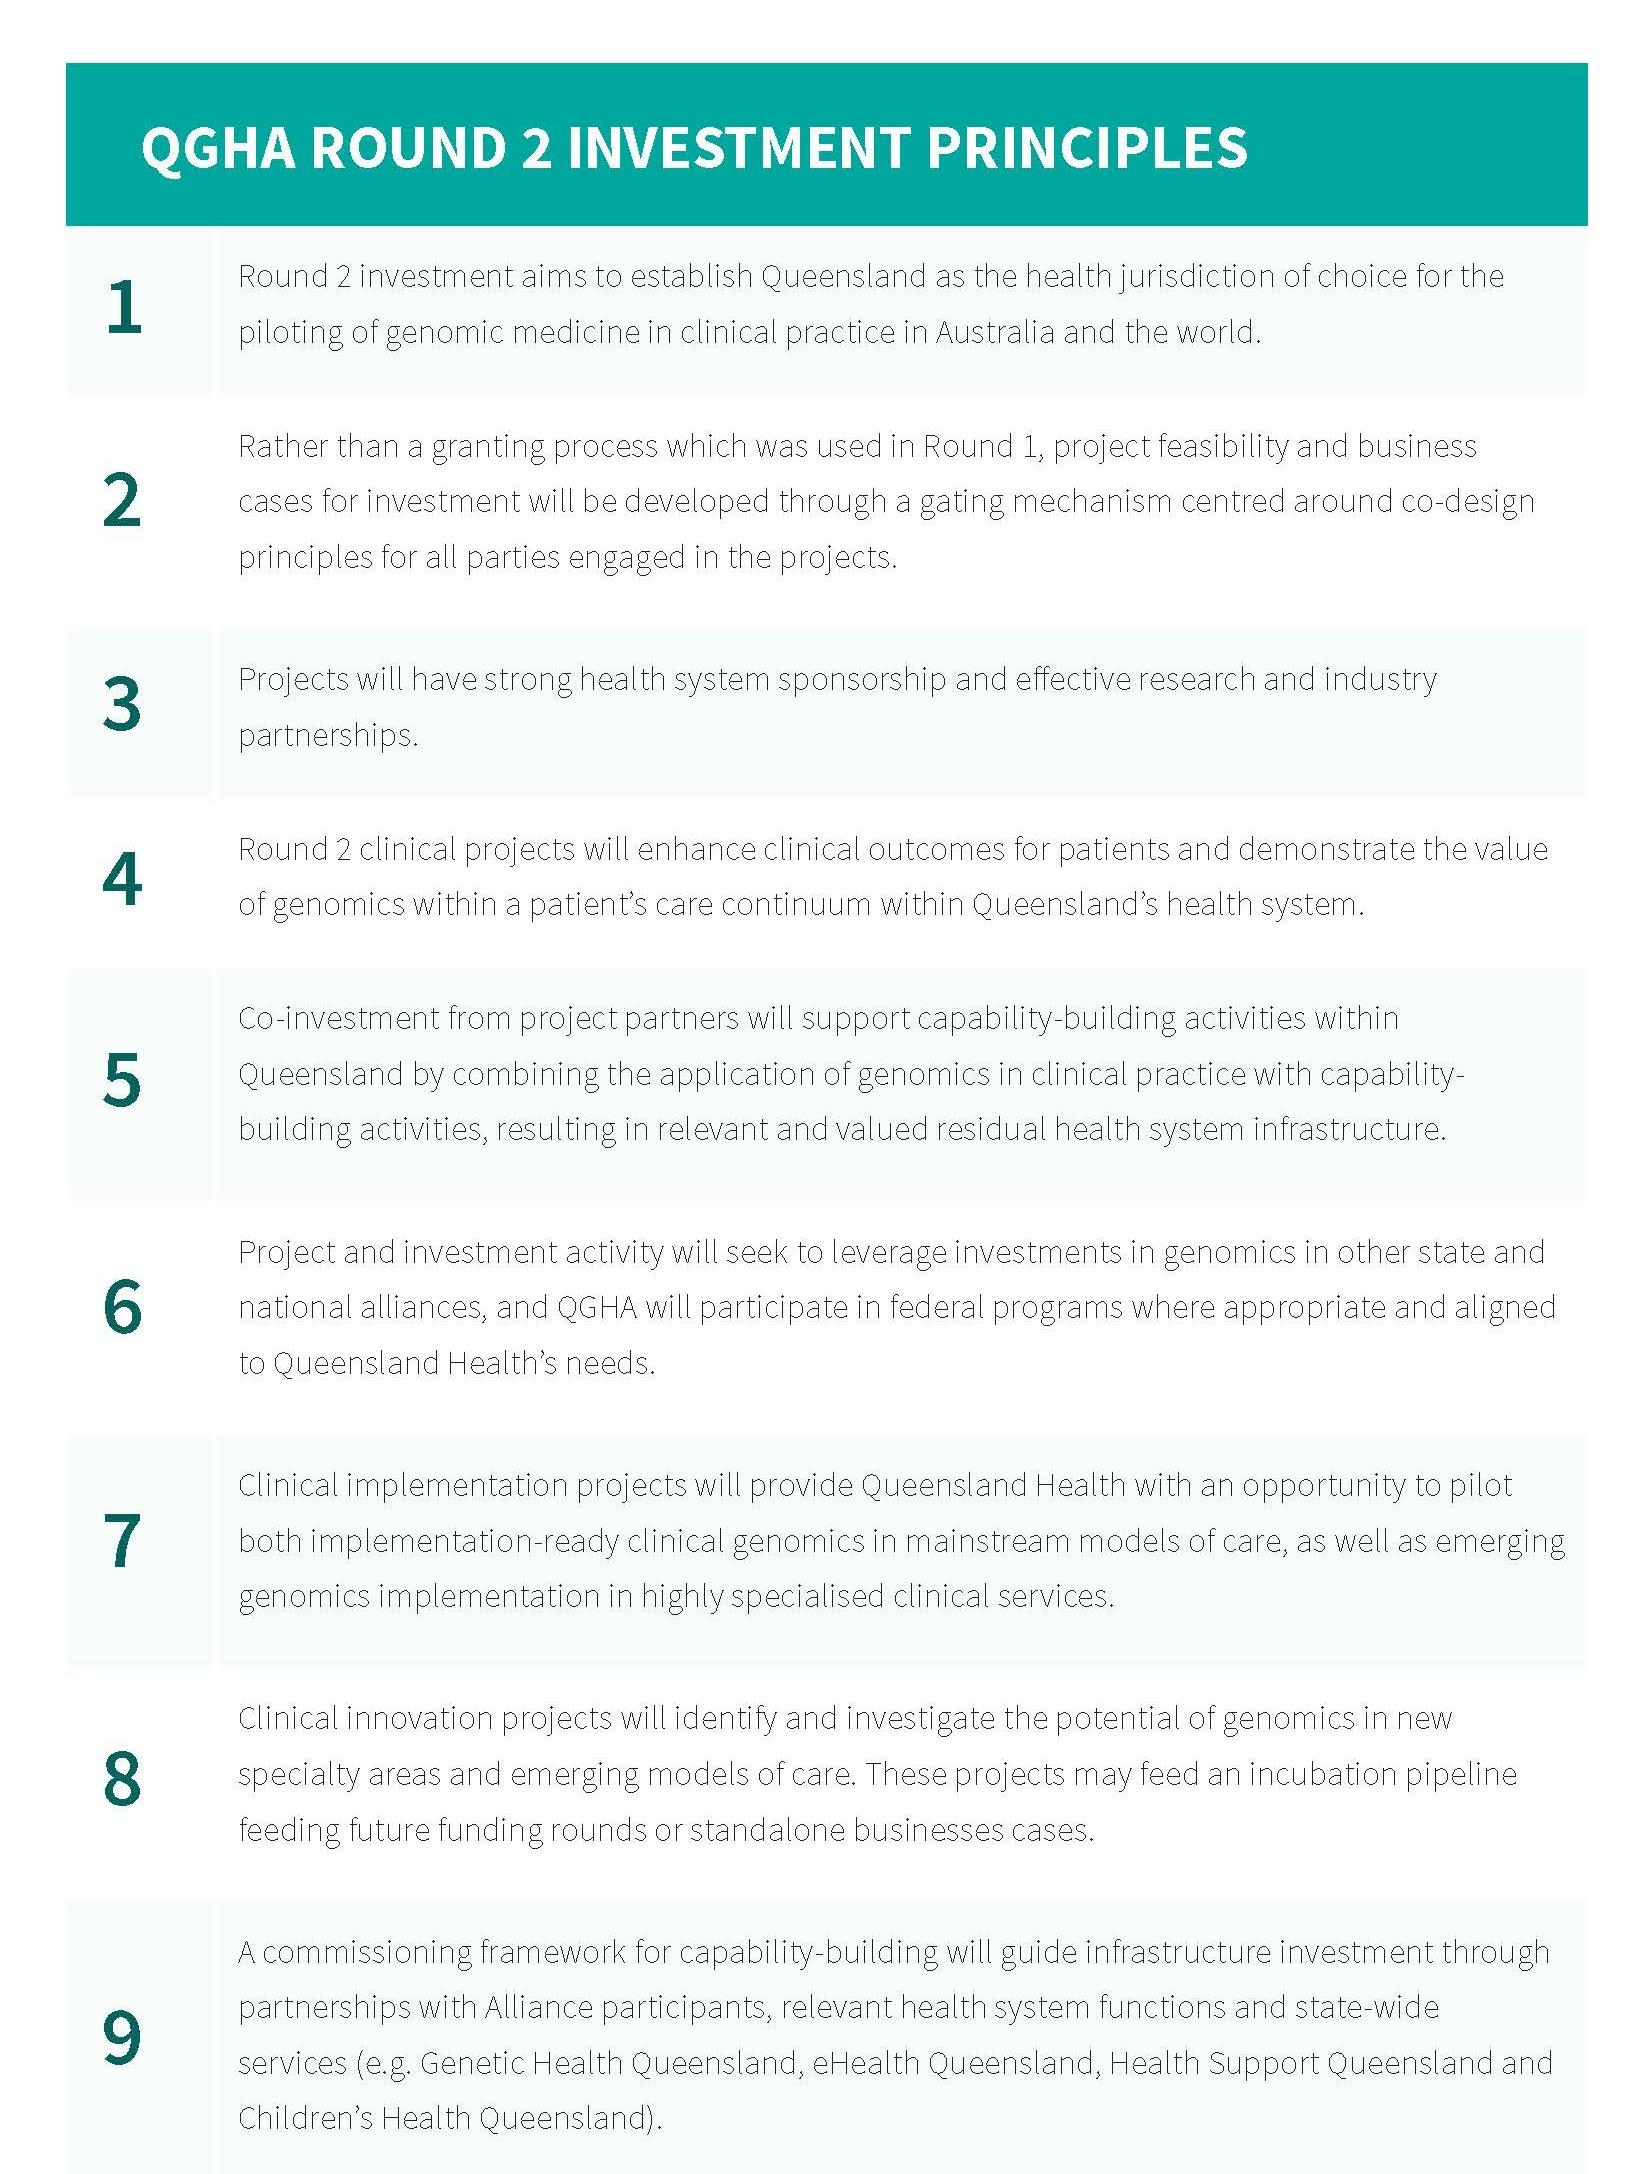 QGHA R2 INVESTMENT PRINCIPLES.jpg